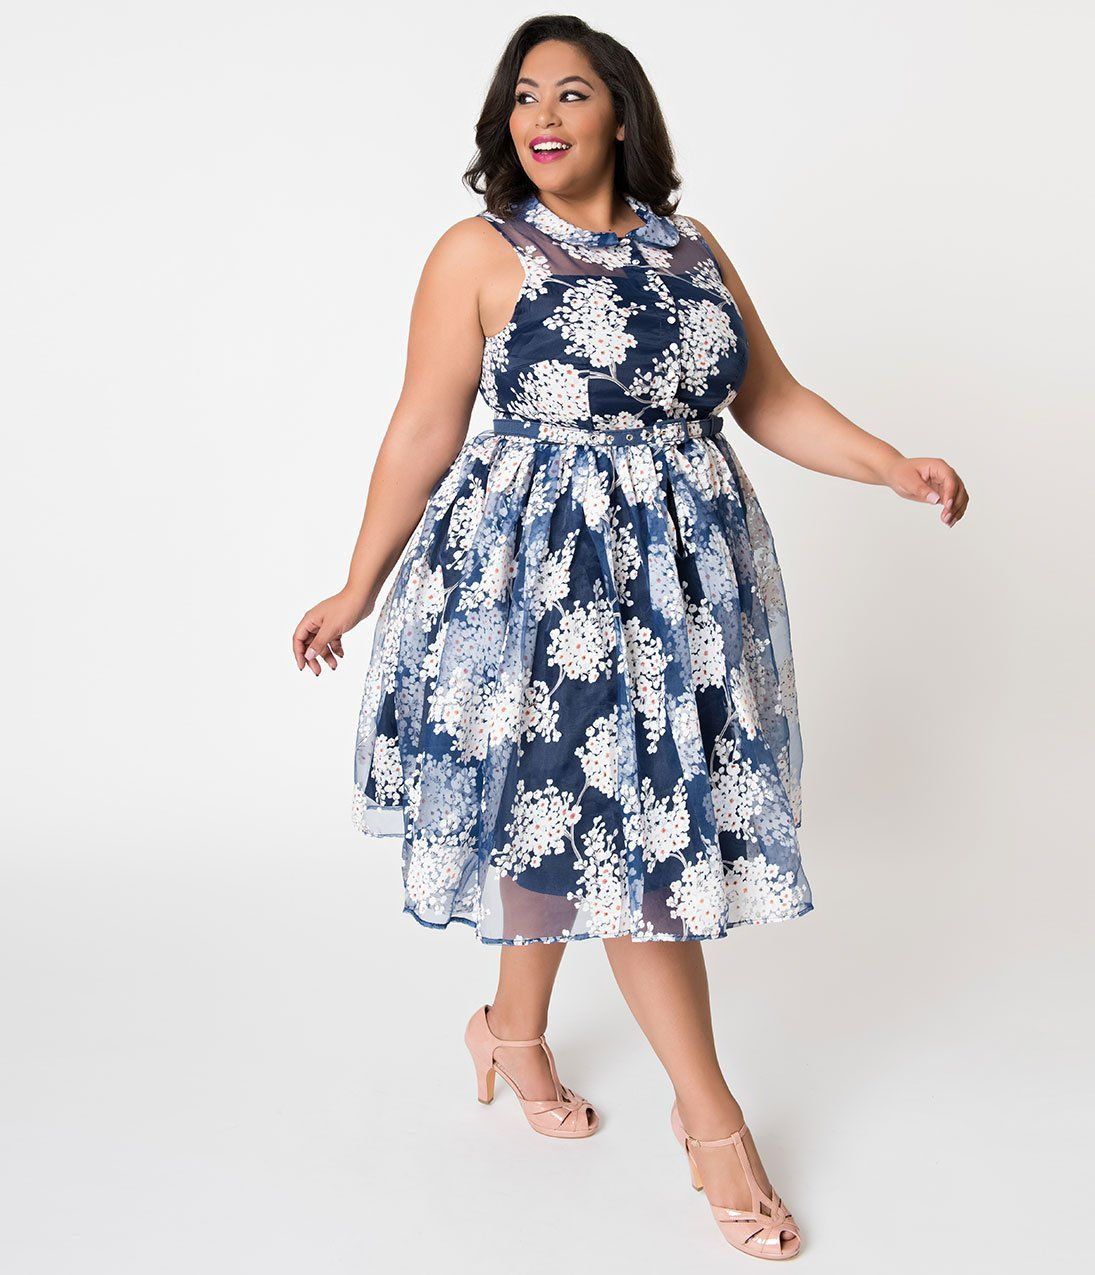 Unique Vintage Plus Size 1950s Style Blue White Floral Organza Georgia Swing Dress Plus Size Vintage Clothing Clothing For Tall Women Dresses [ 1275 x 1095 Pixel ]